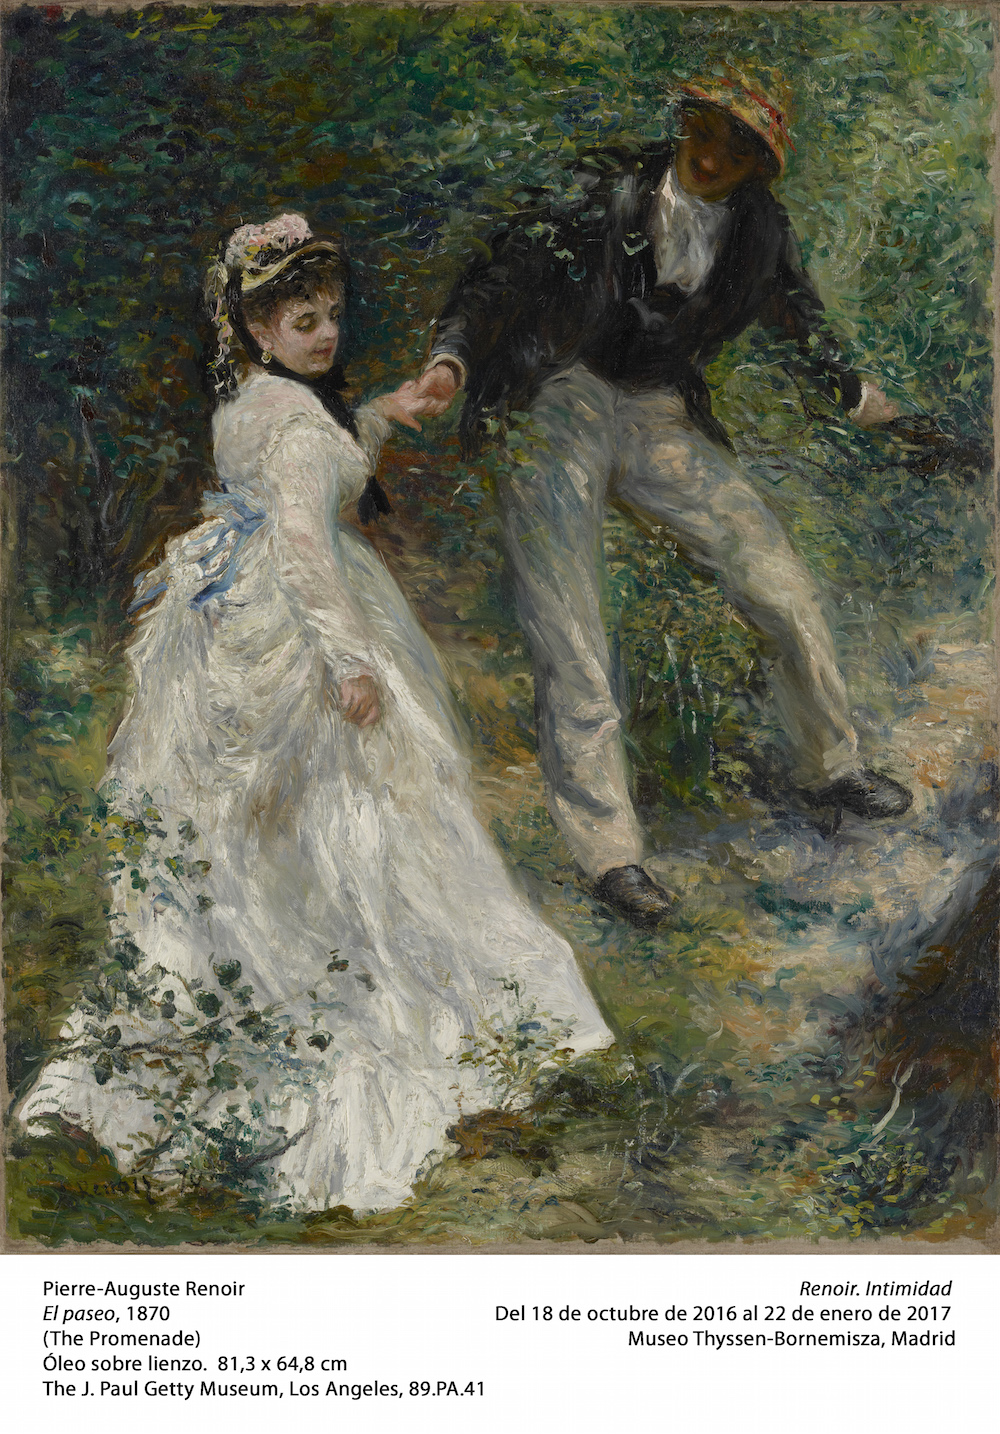 Pierre-Auguste Renoir, El paseo, 1870. Museo Thyssen-Bornemisza, Madrid, 2016.